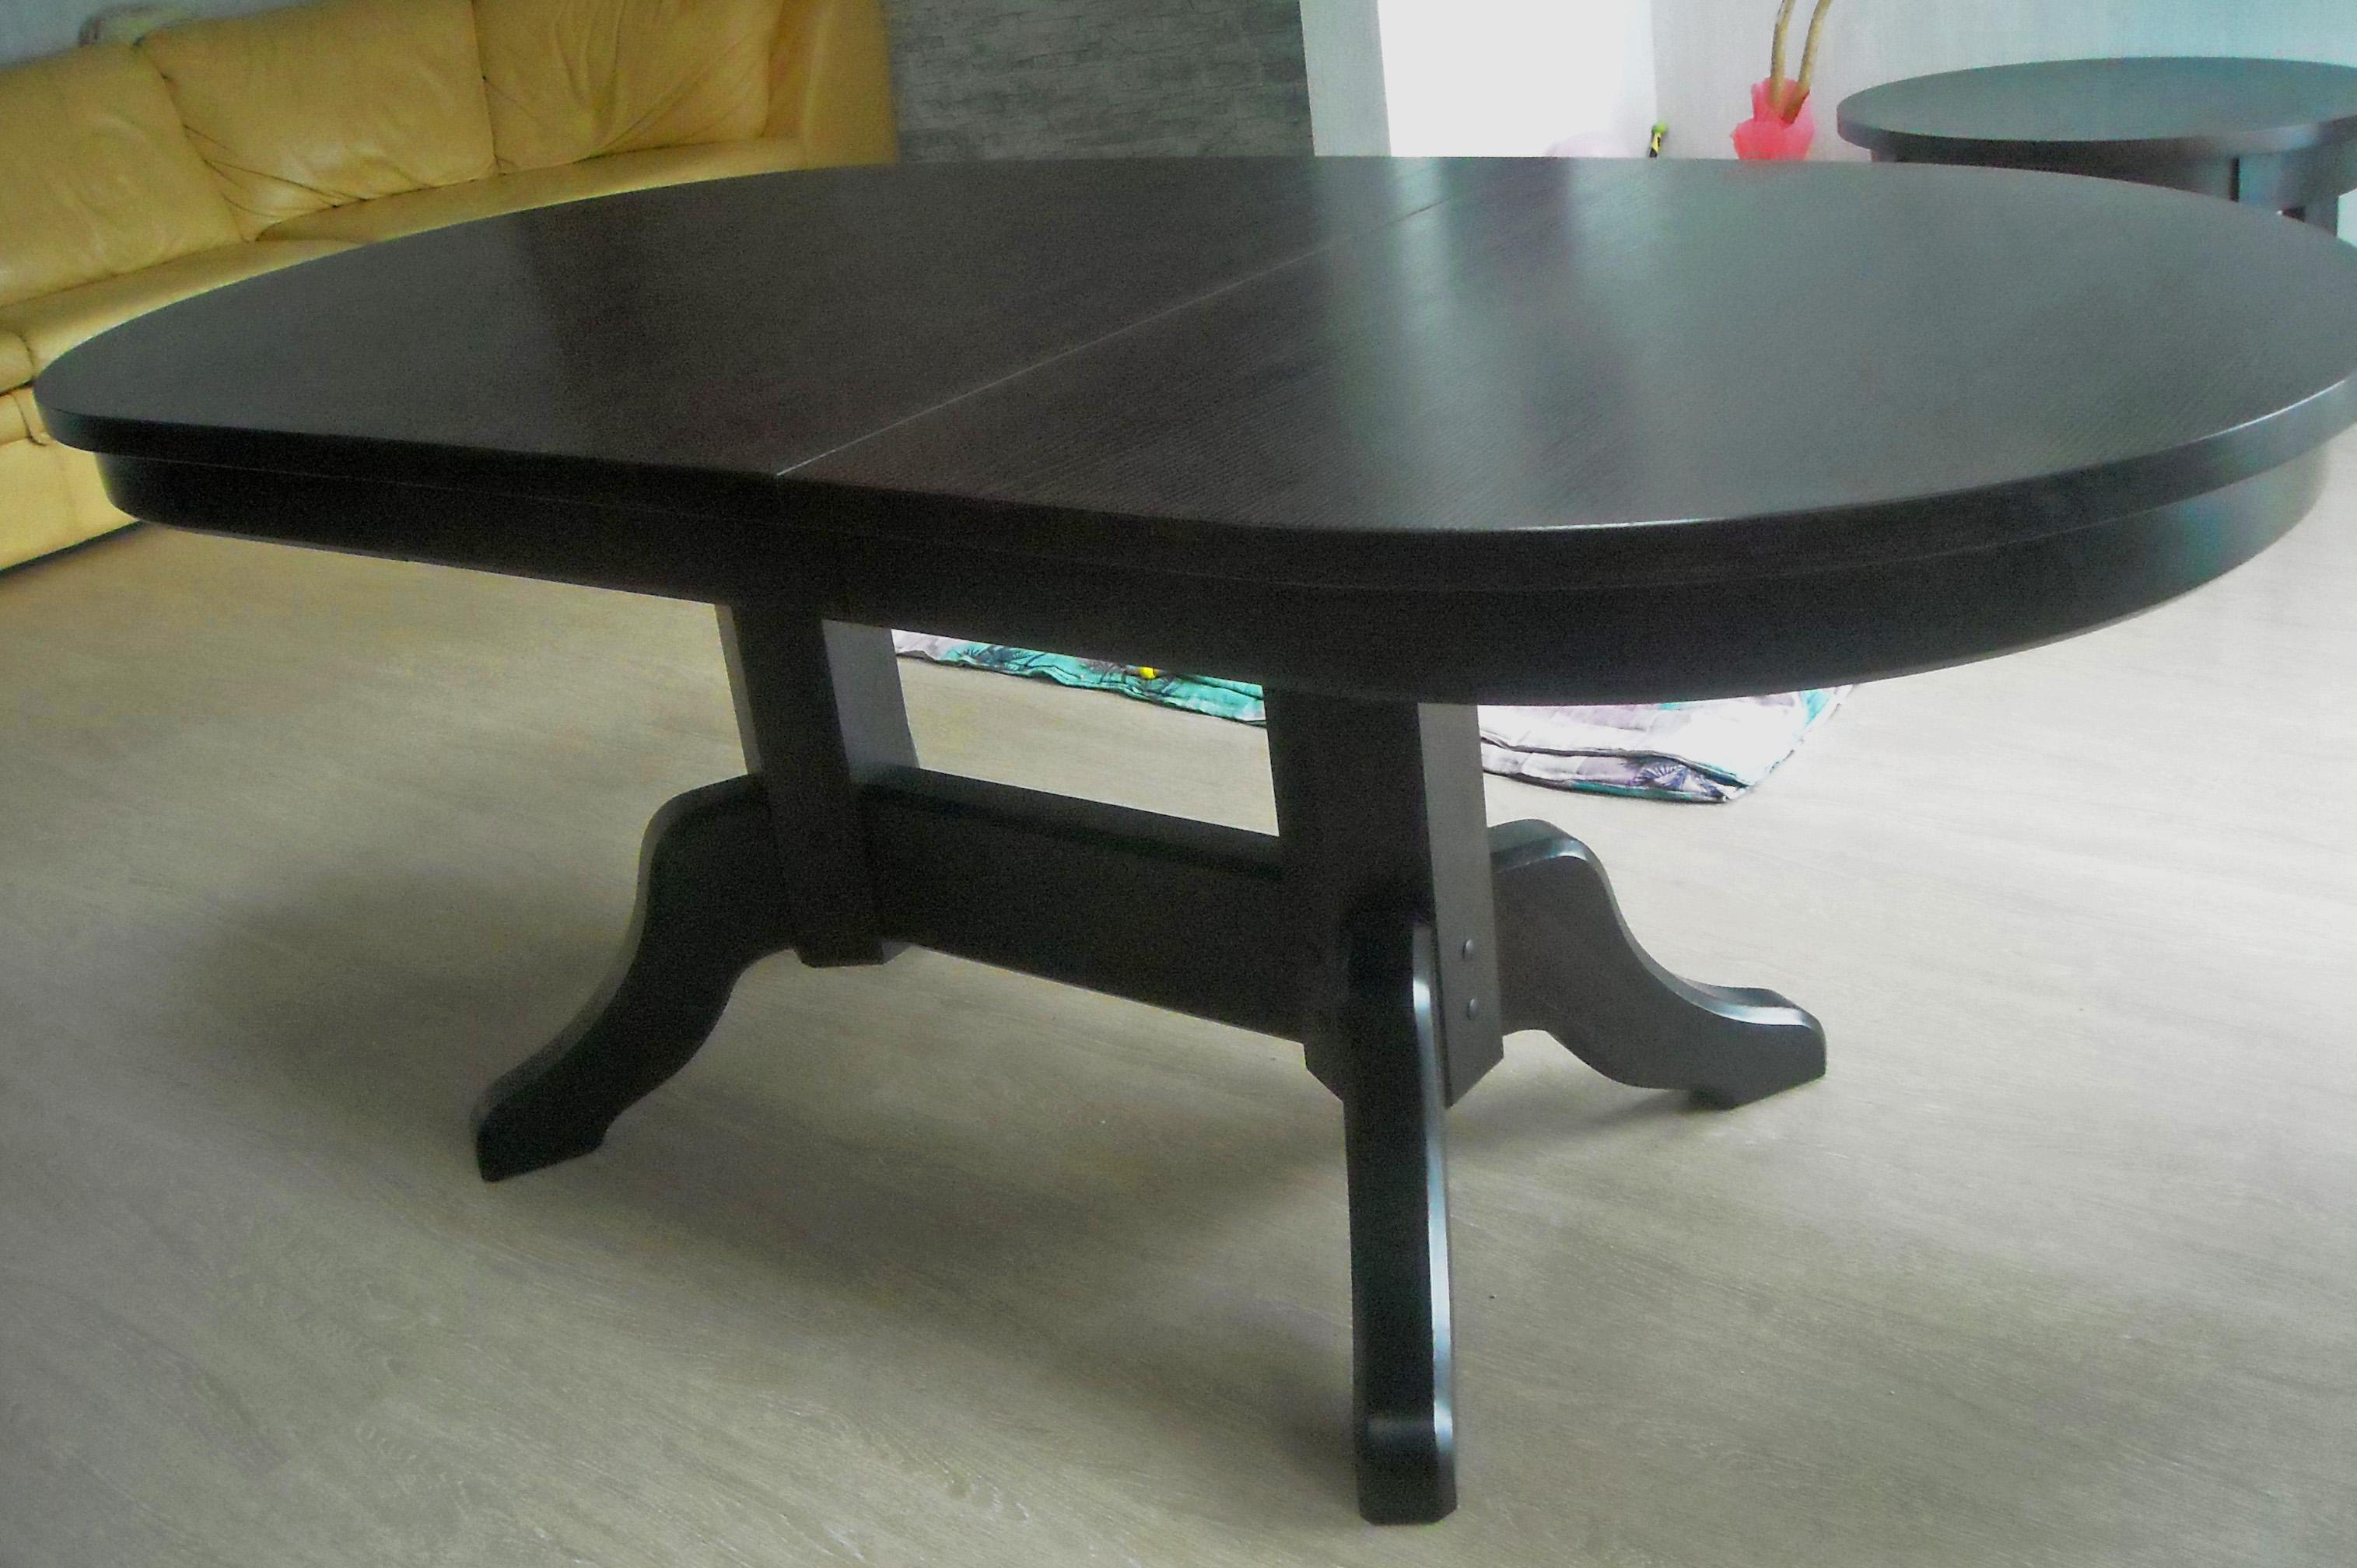 Finierēts oša galds, izvelkams